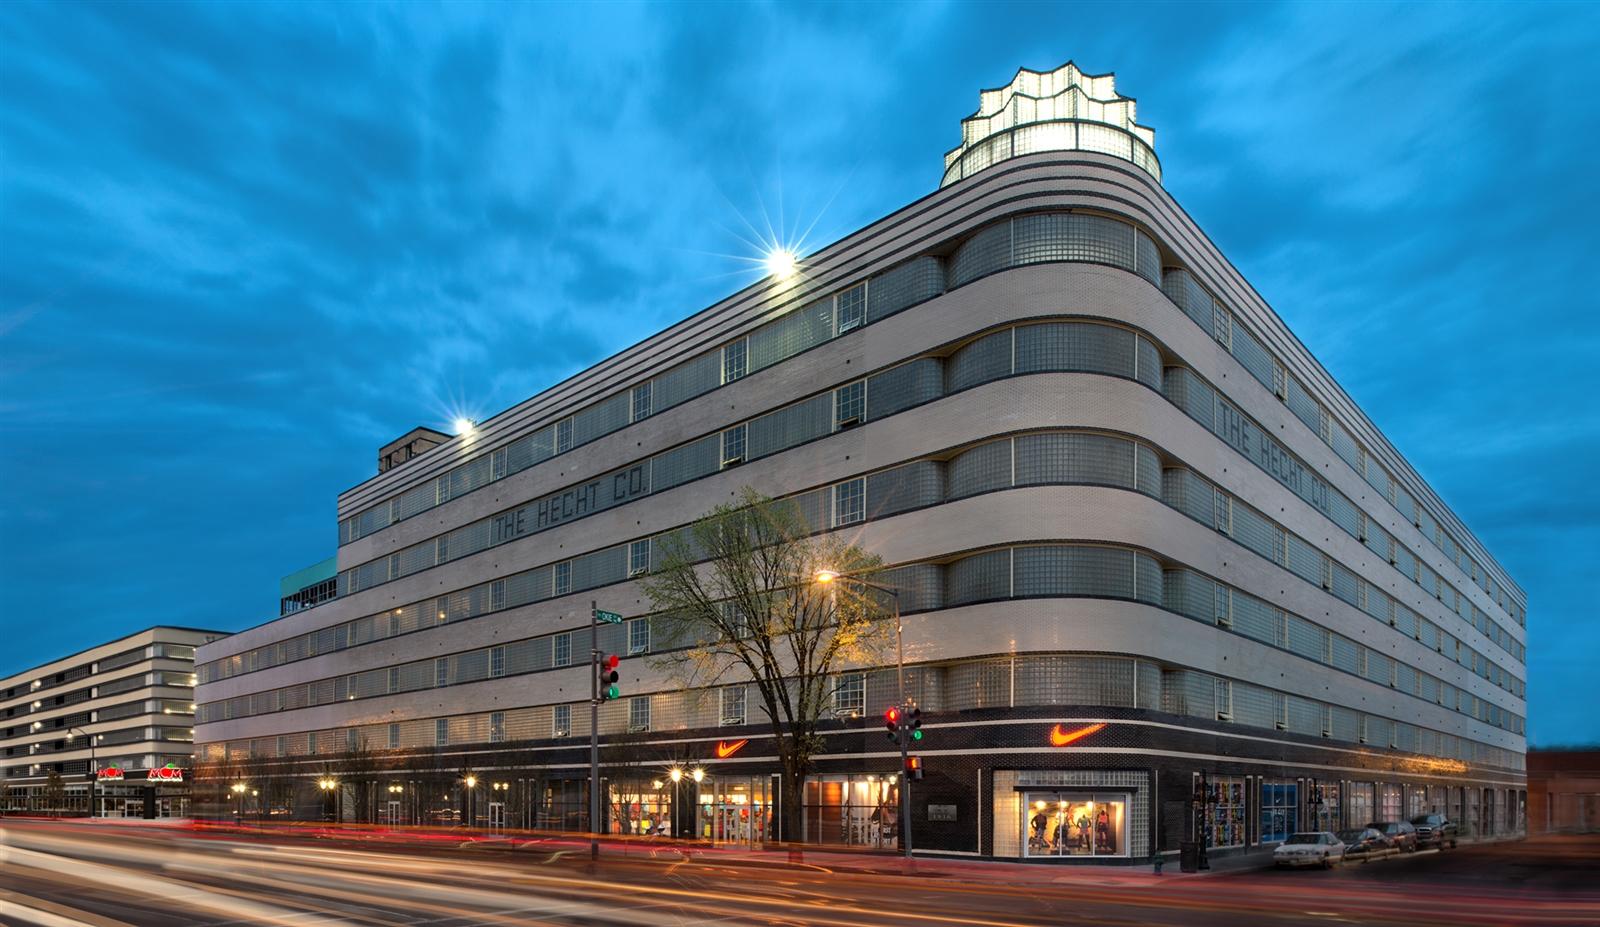 Hecht Warehouse is a development on New York Avenue, NE, in Washington, D.C. (Photo from Douglas Development)